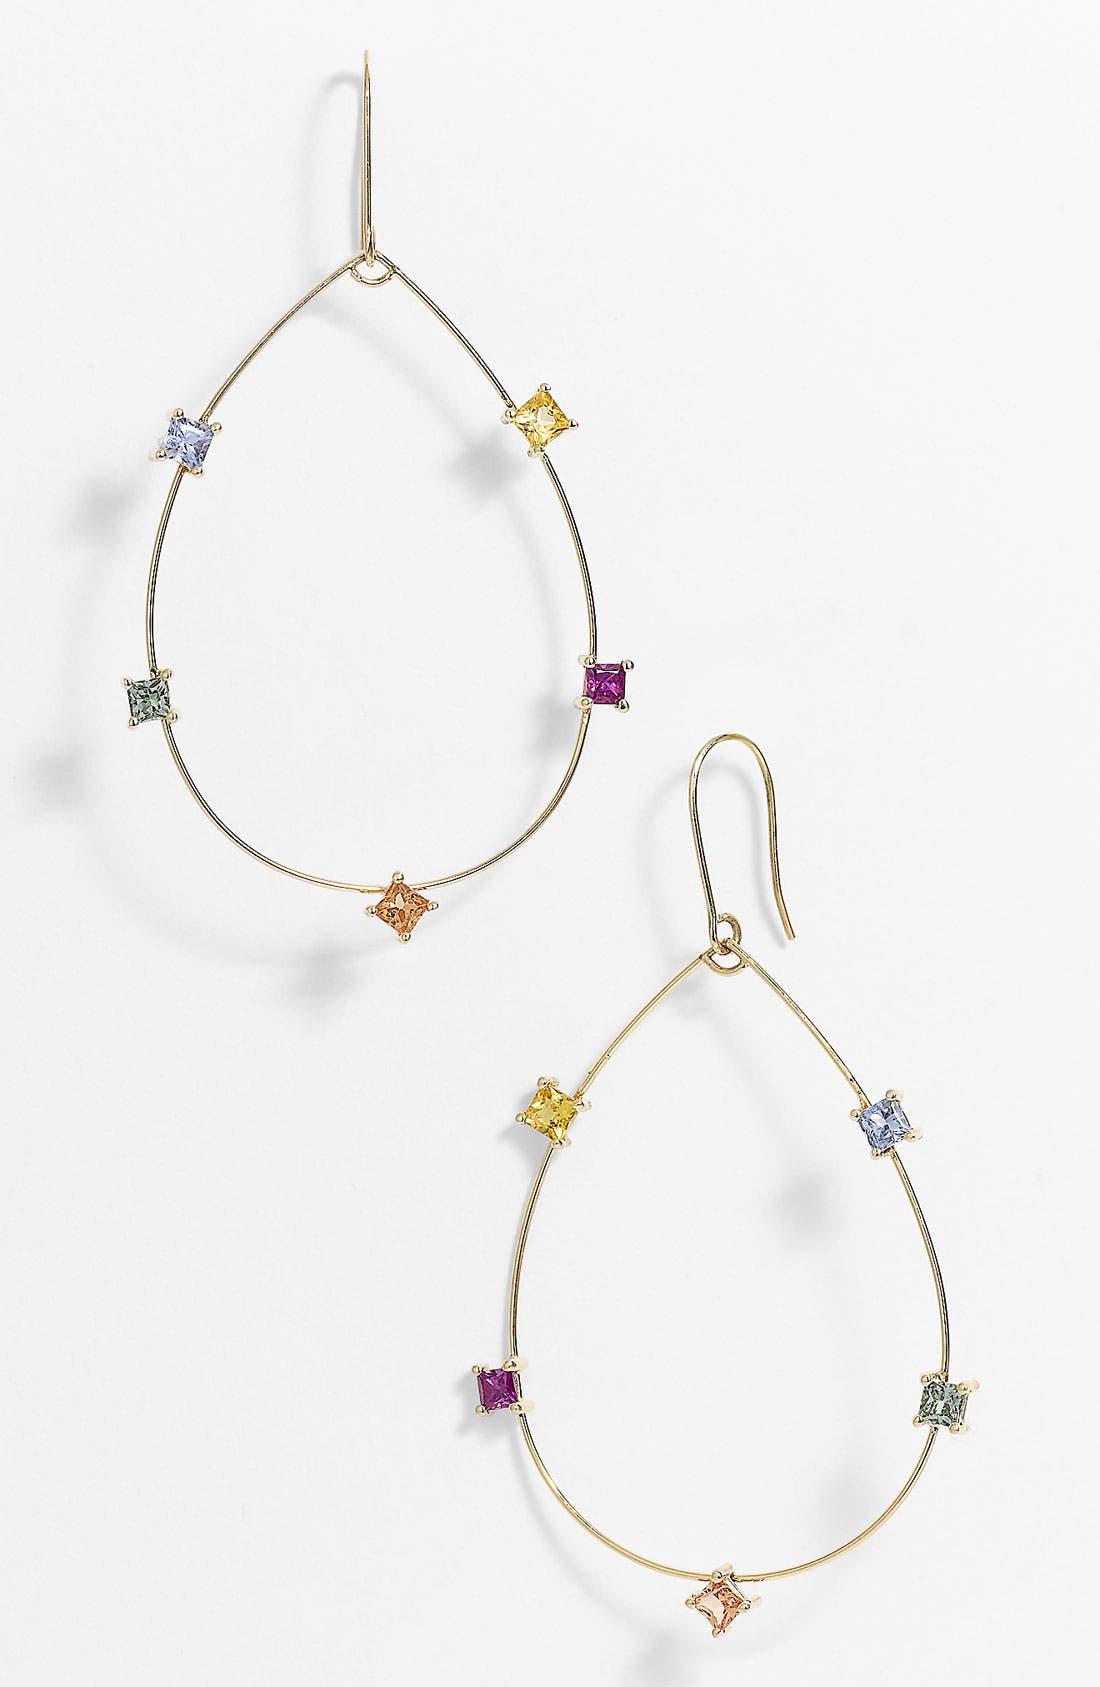 Alternate Image 1 Selected - Lana Jewelry Small Ombré Hoop Drop Earrings